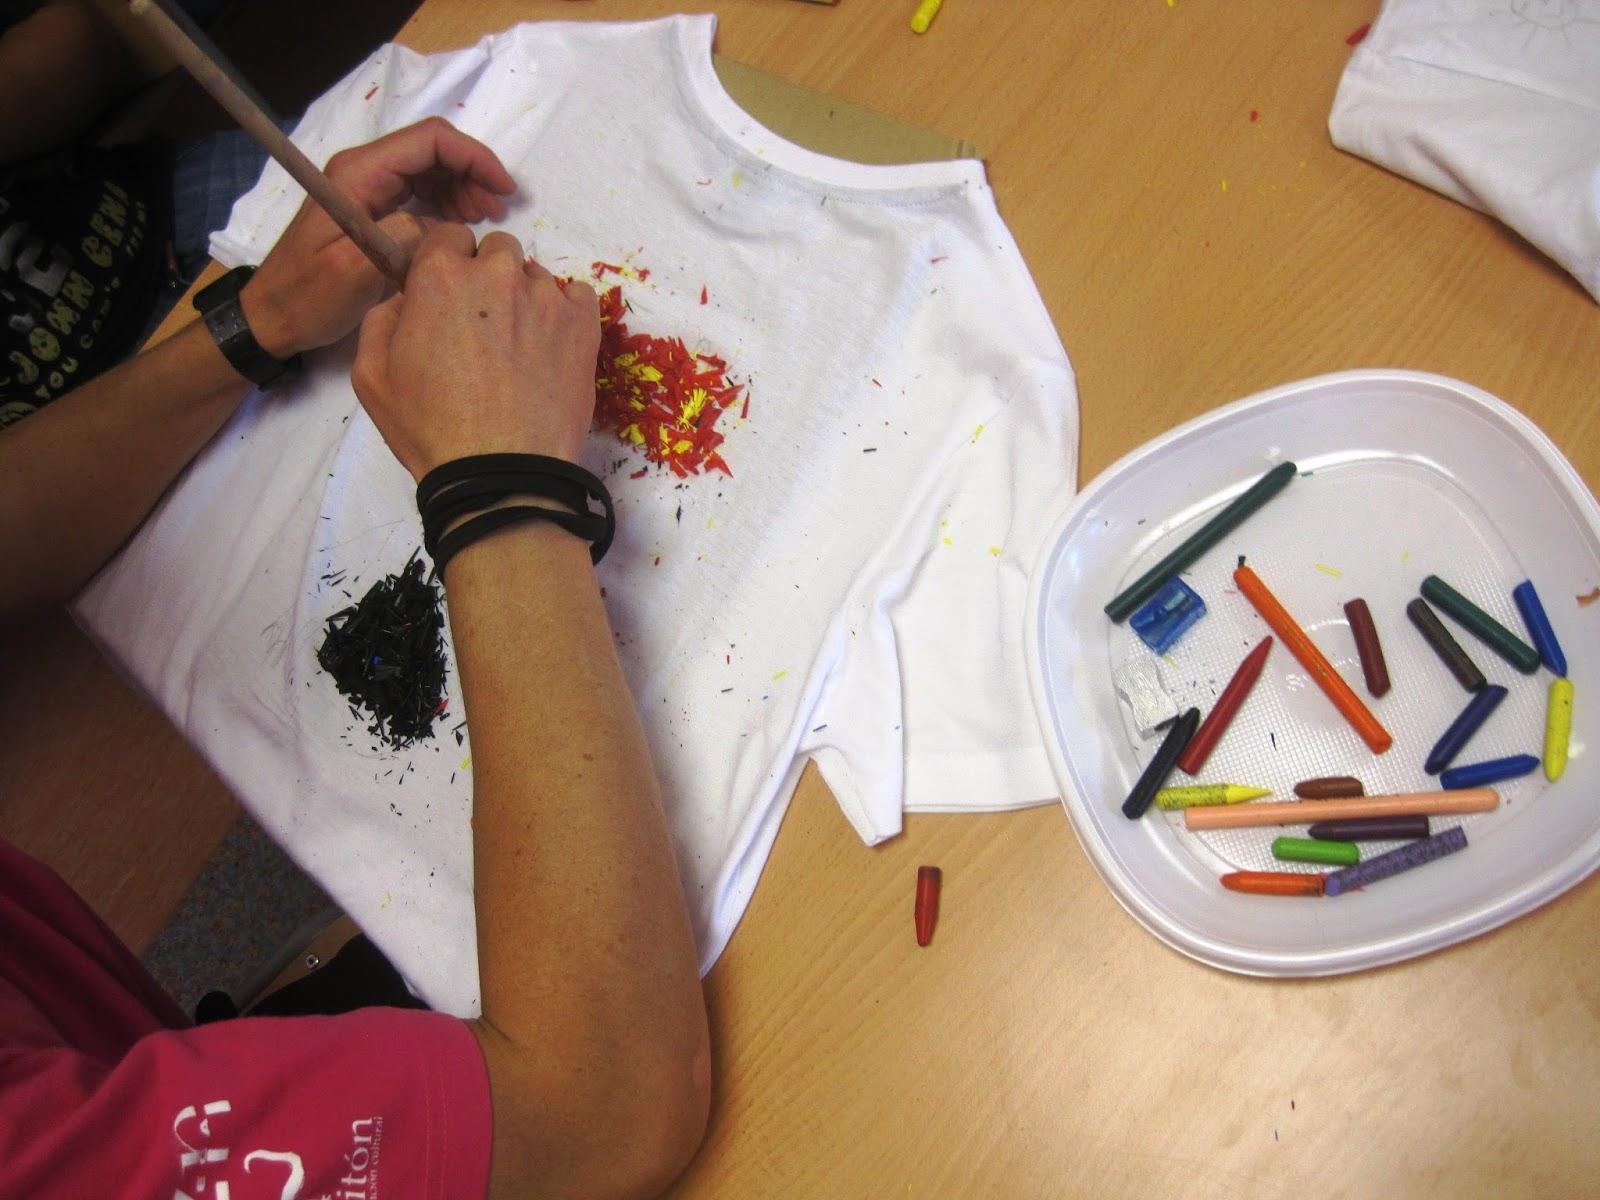 Diy pintar camisetas con pinturas plastidecor - Pinturas para pintar camisetas ...